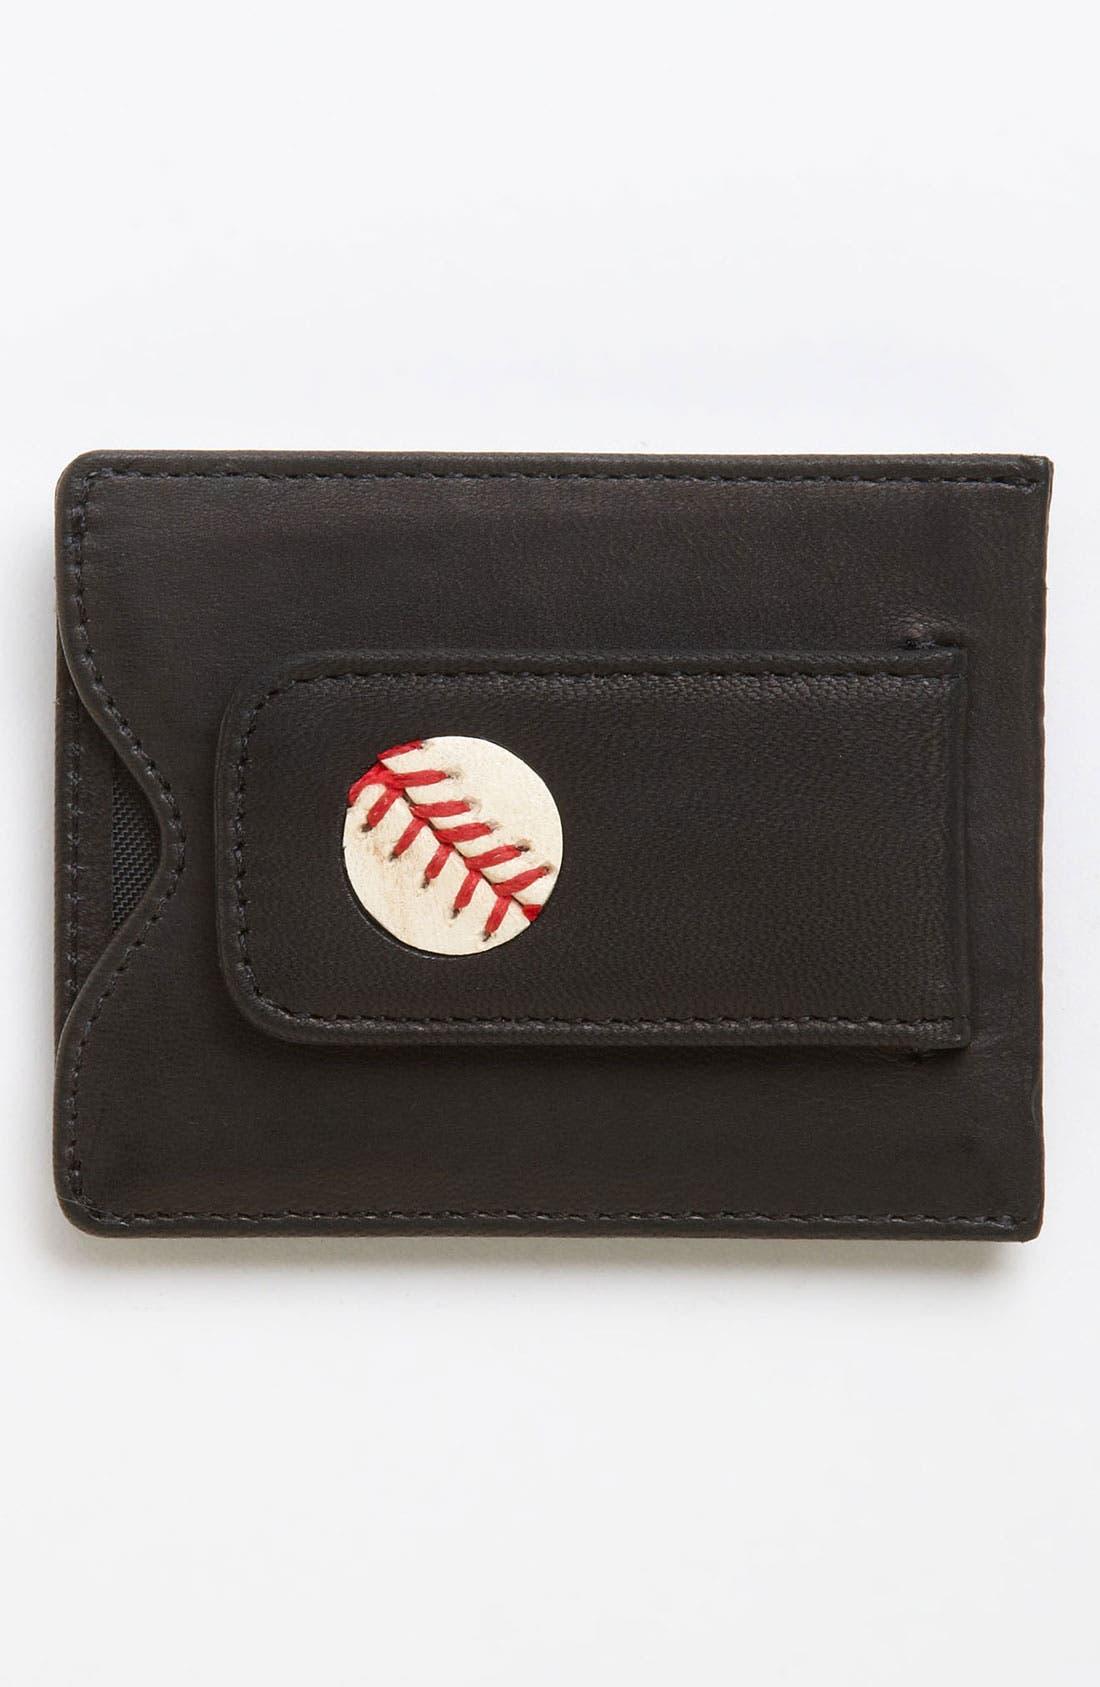 Main Image - Tokens & Icons 'Texas Rangers' MLB™ Game-Played-Baseball Card Case